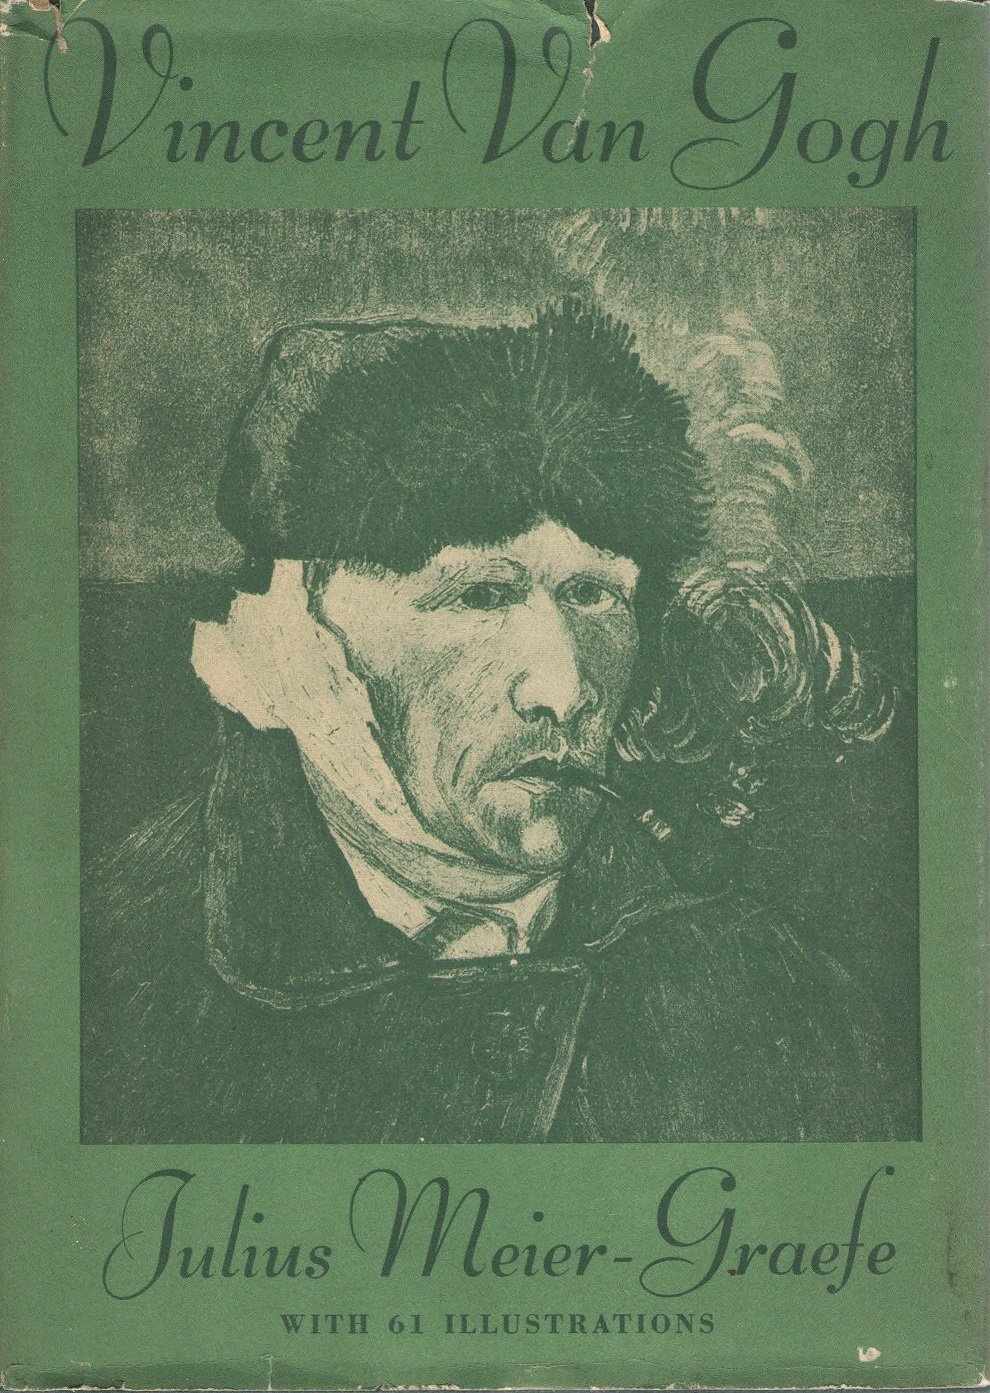 Vincent van Gogh; a biographical study, Meier-Graefe, Julius